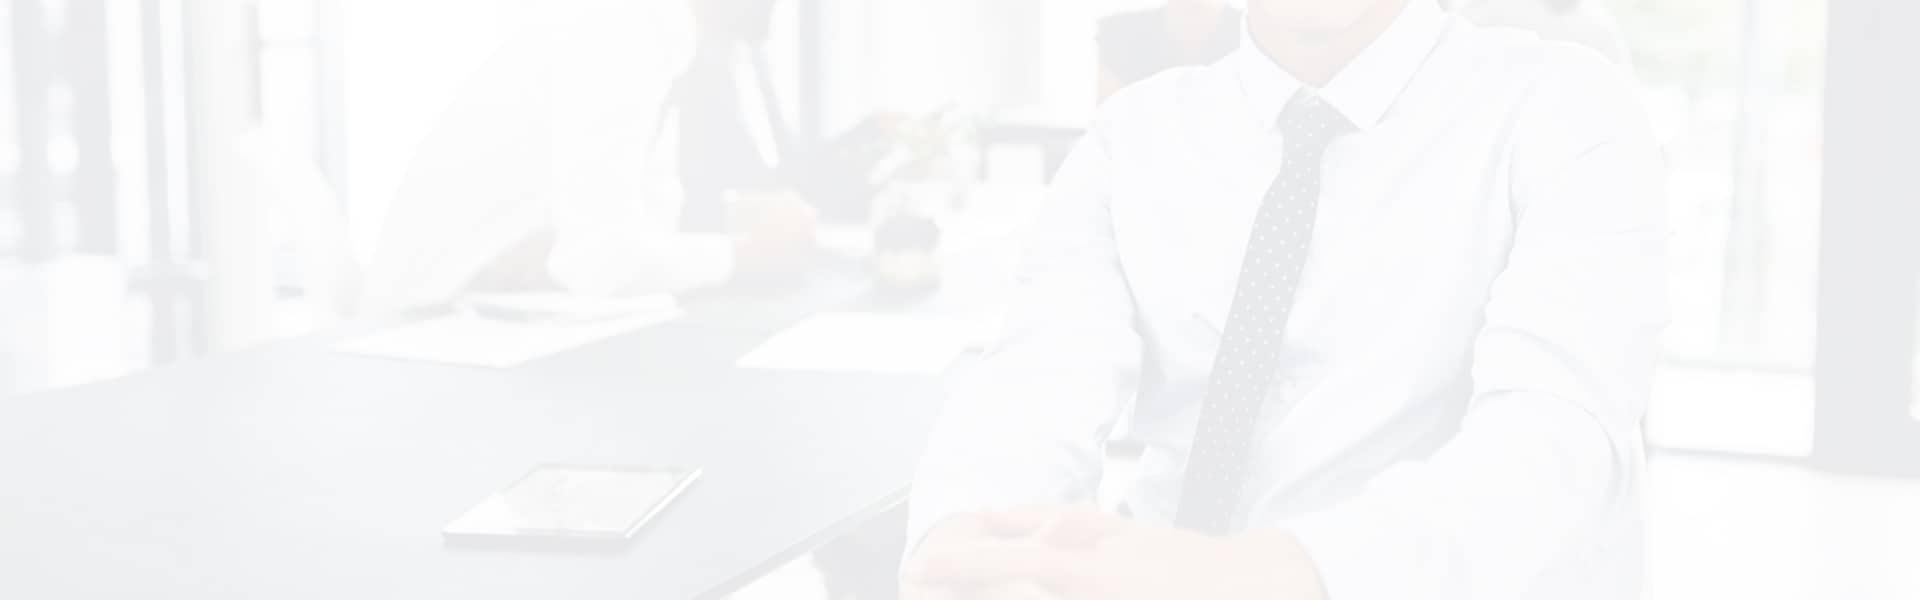 Franchise Business Plan – Century 21